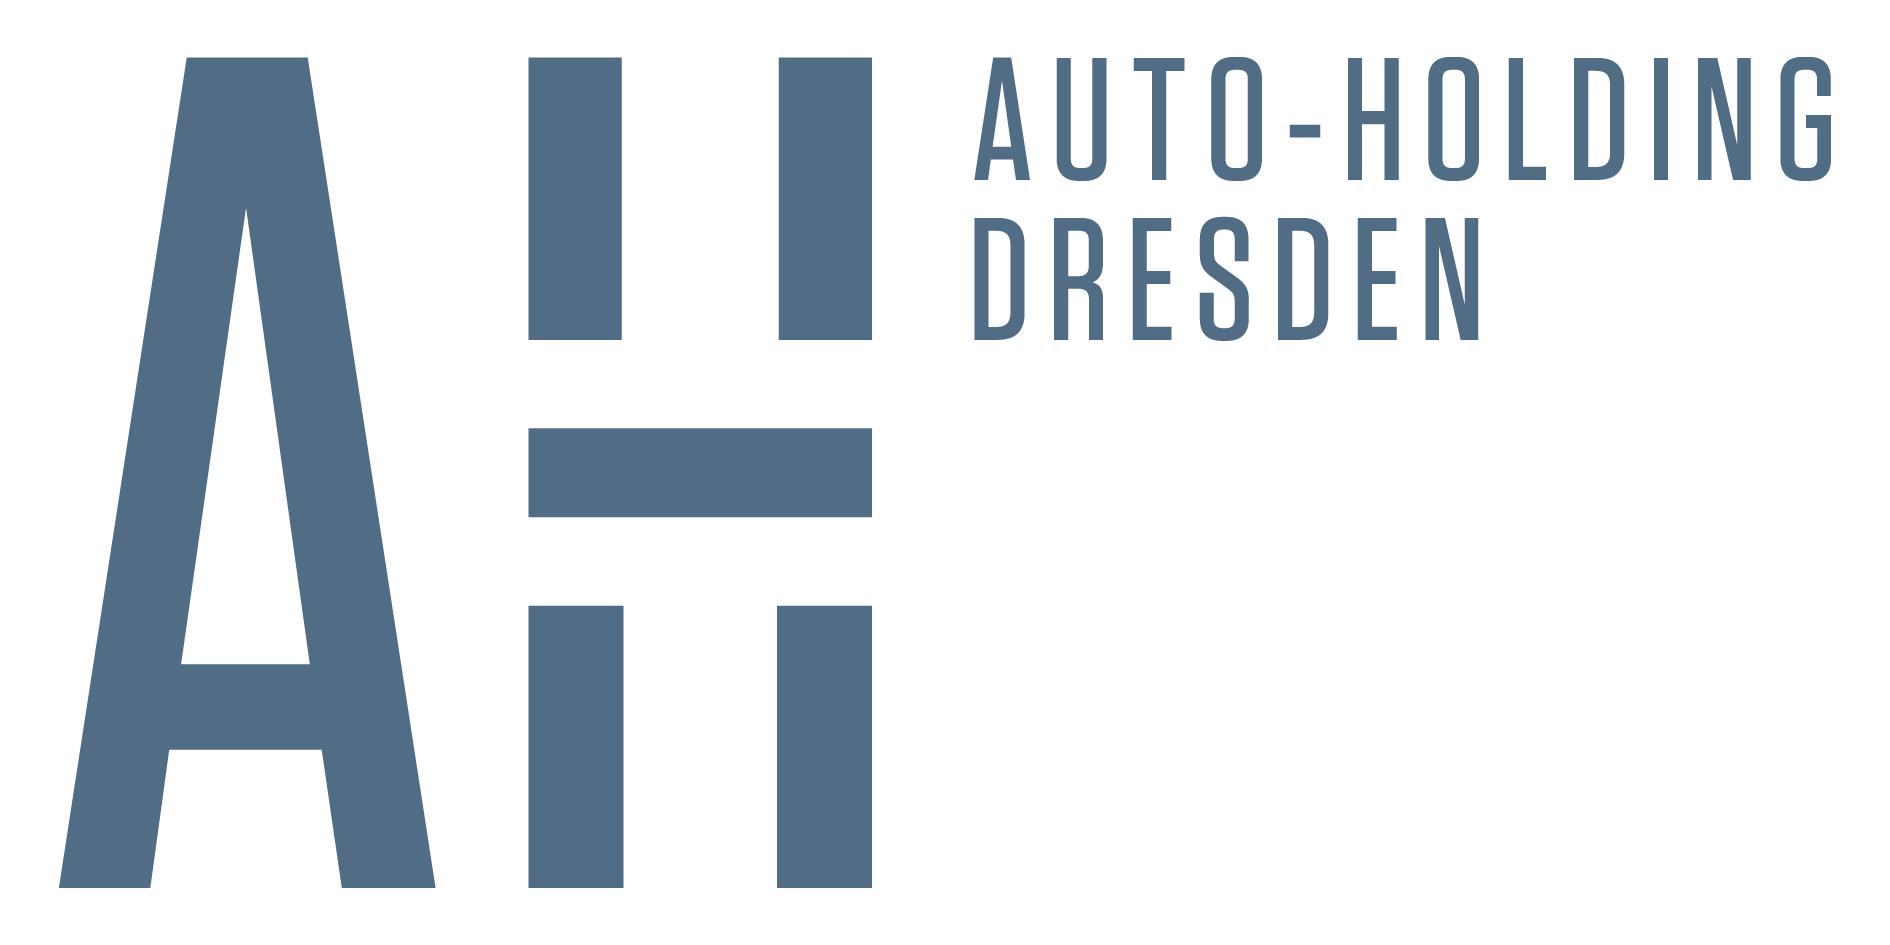 Auto-Holding Dresden GmbH